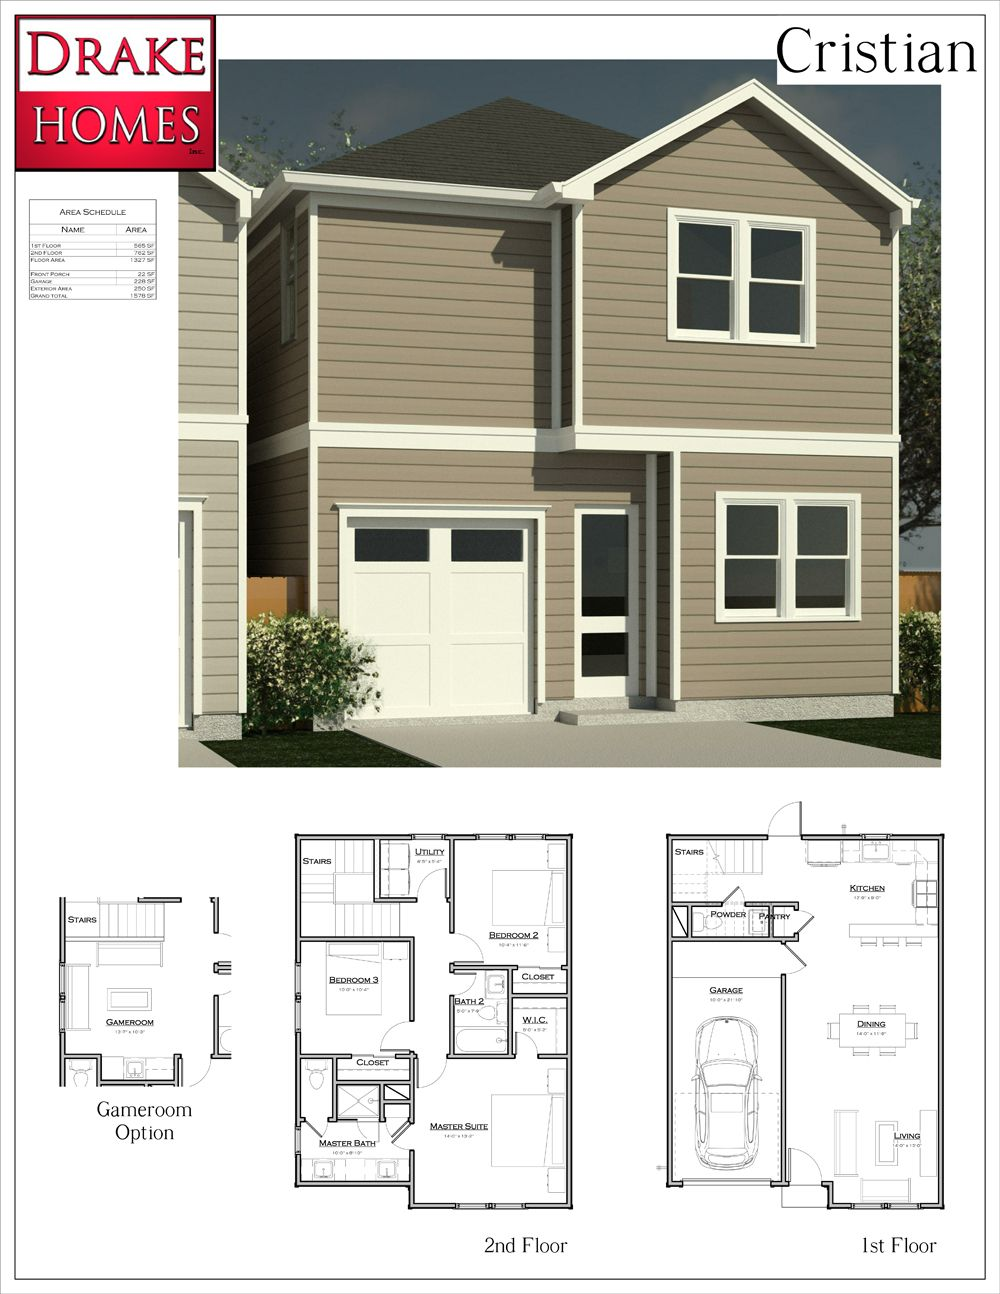 Cristian Floorplan Oaks Of Lawndale By Drake Homes Inc Houston Texas Floor Plans Home Inc House Plans